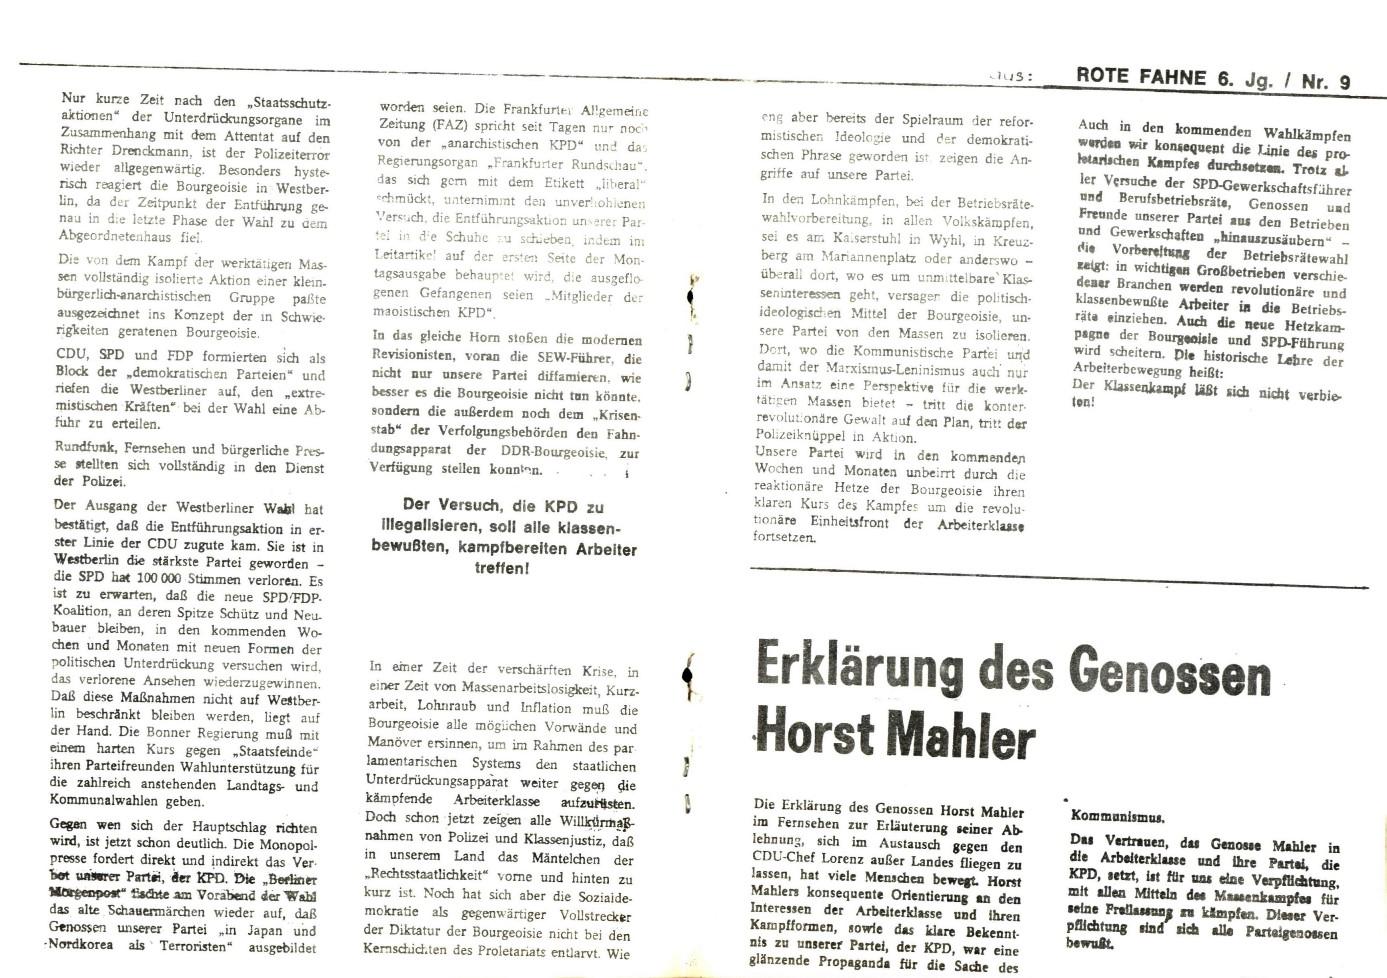 Hannover_AO_1975_Fahrpreisboykott_14